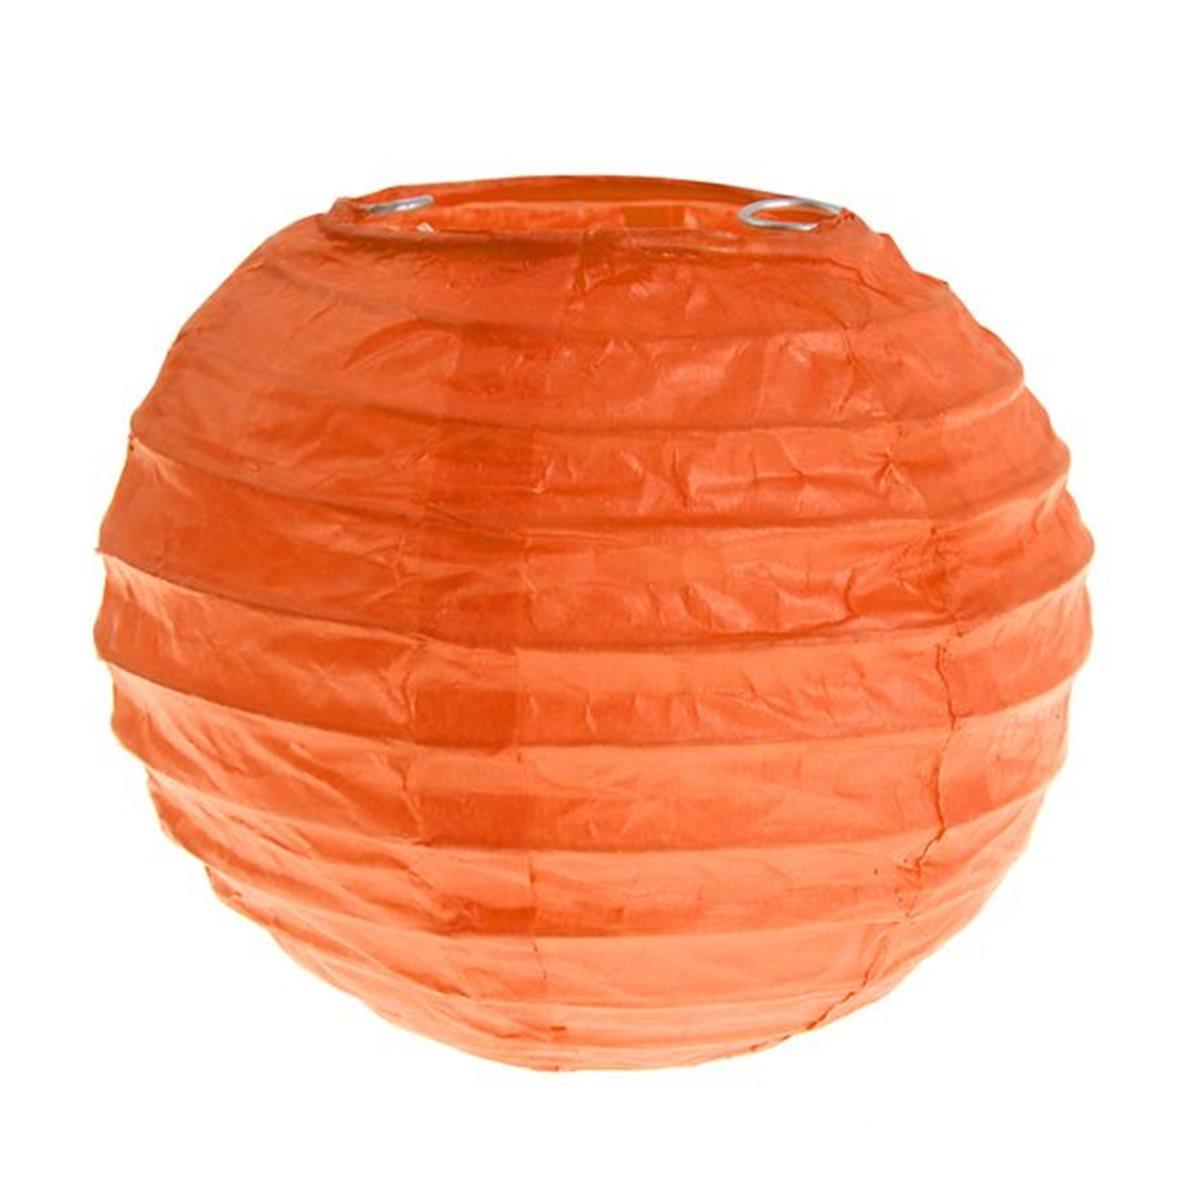 2x Petite Lanterne Papier 10cm - Orange